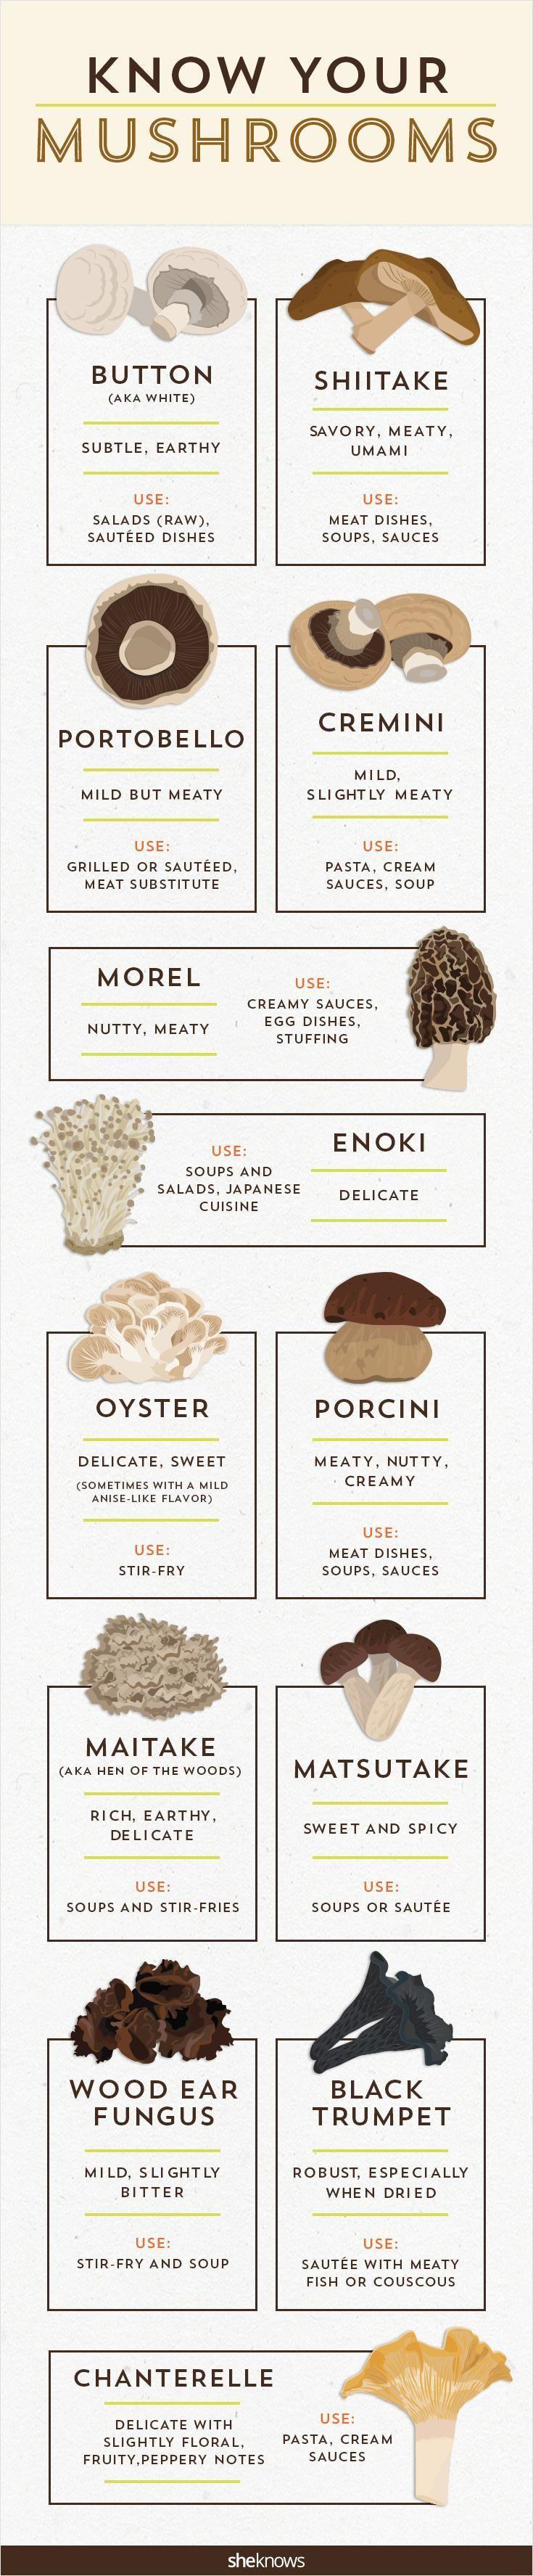 Mushroom guide